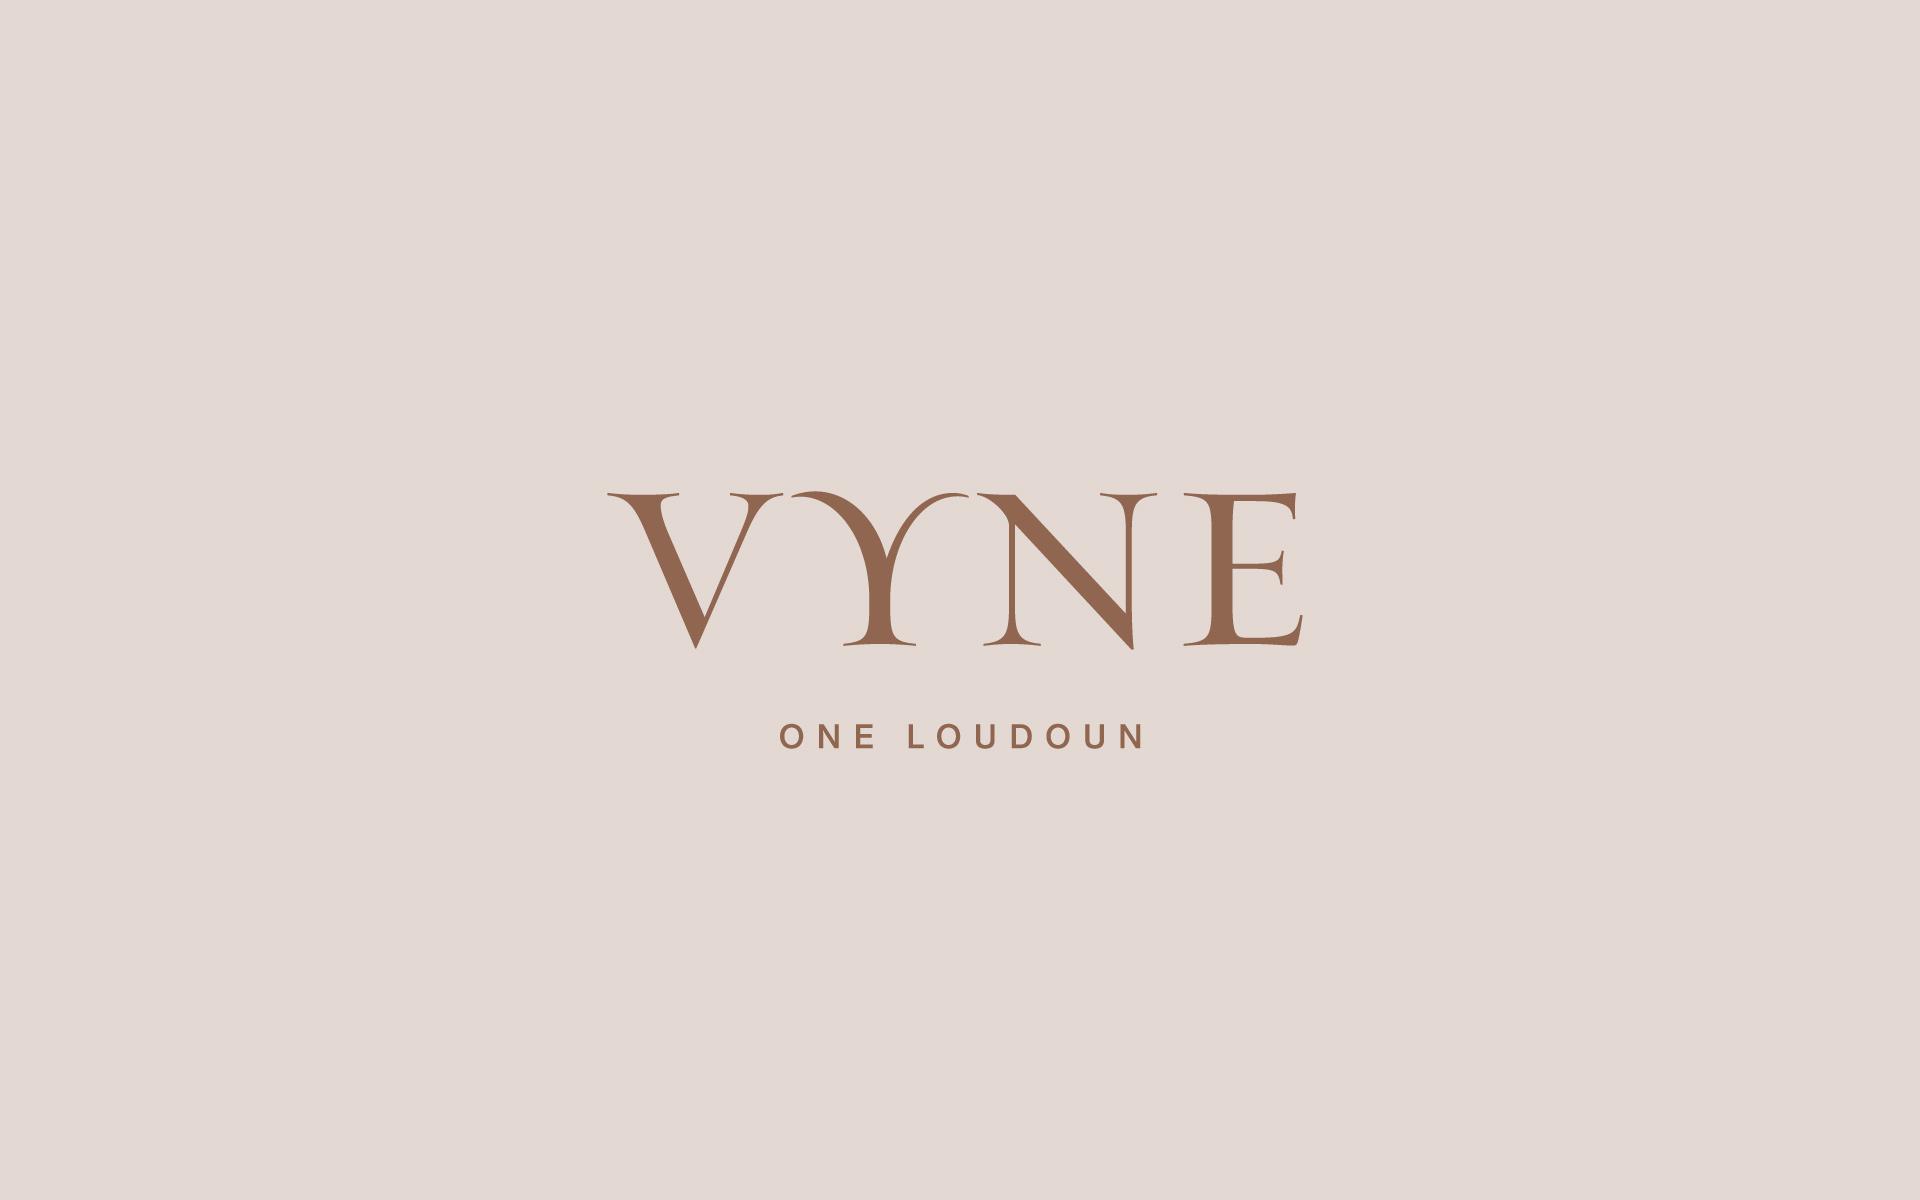 Vyne_Logotype